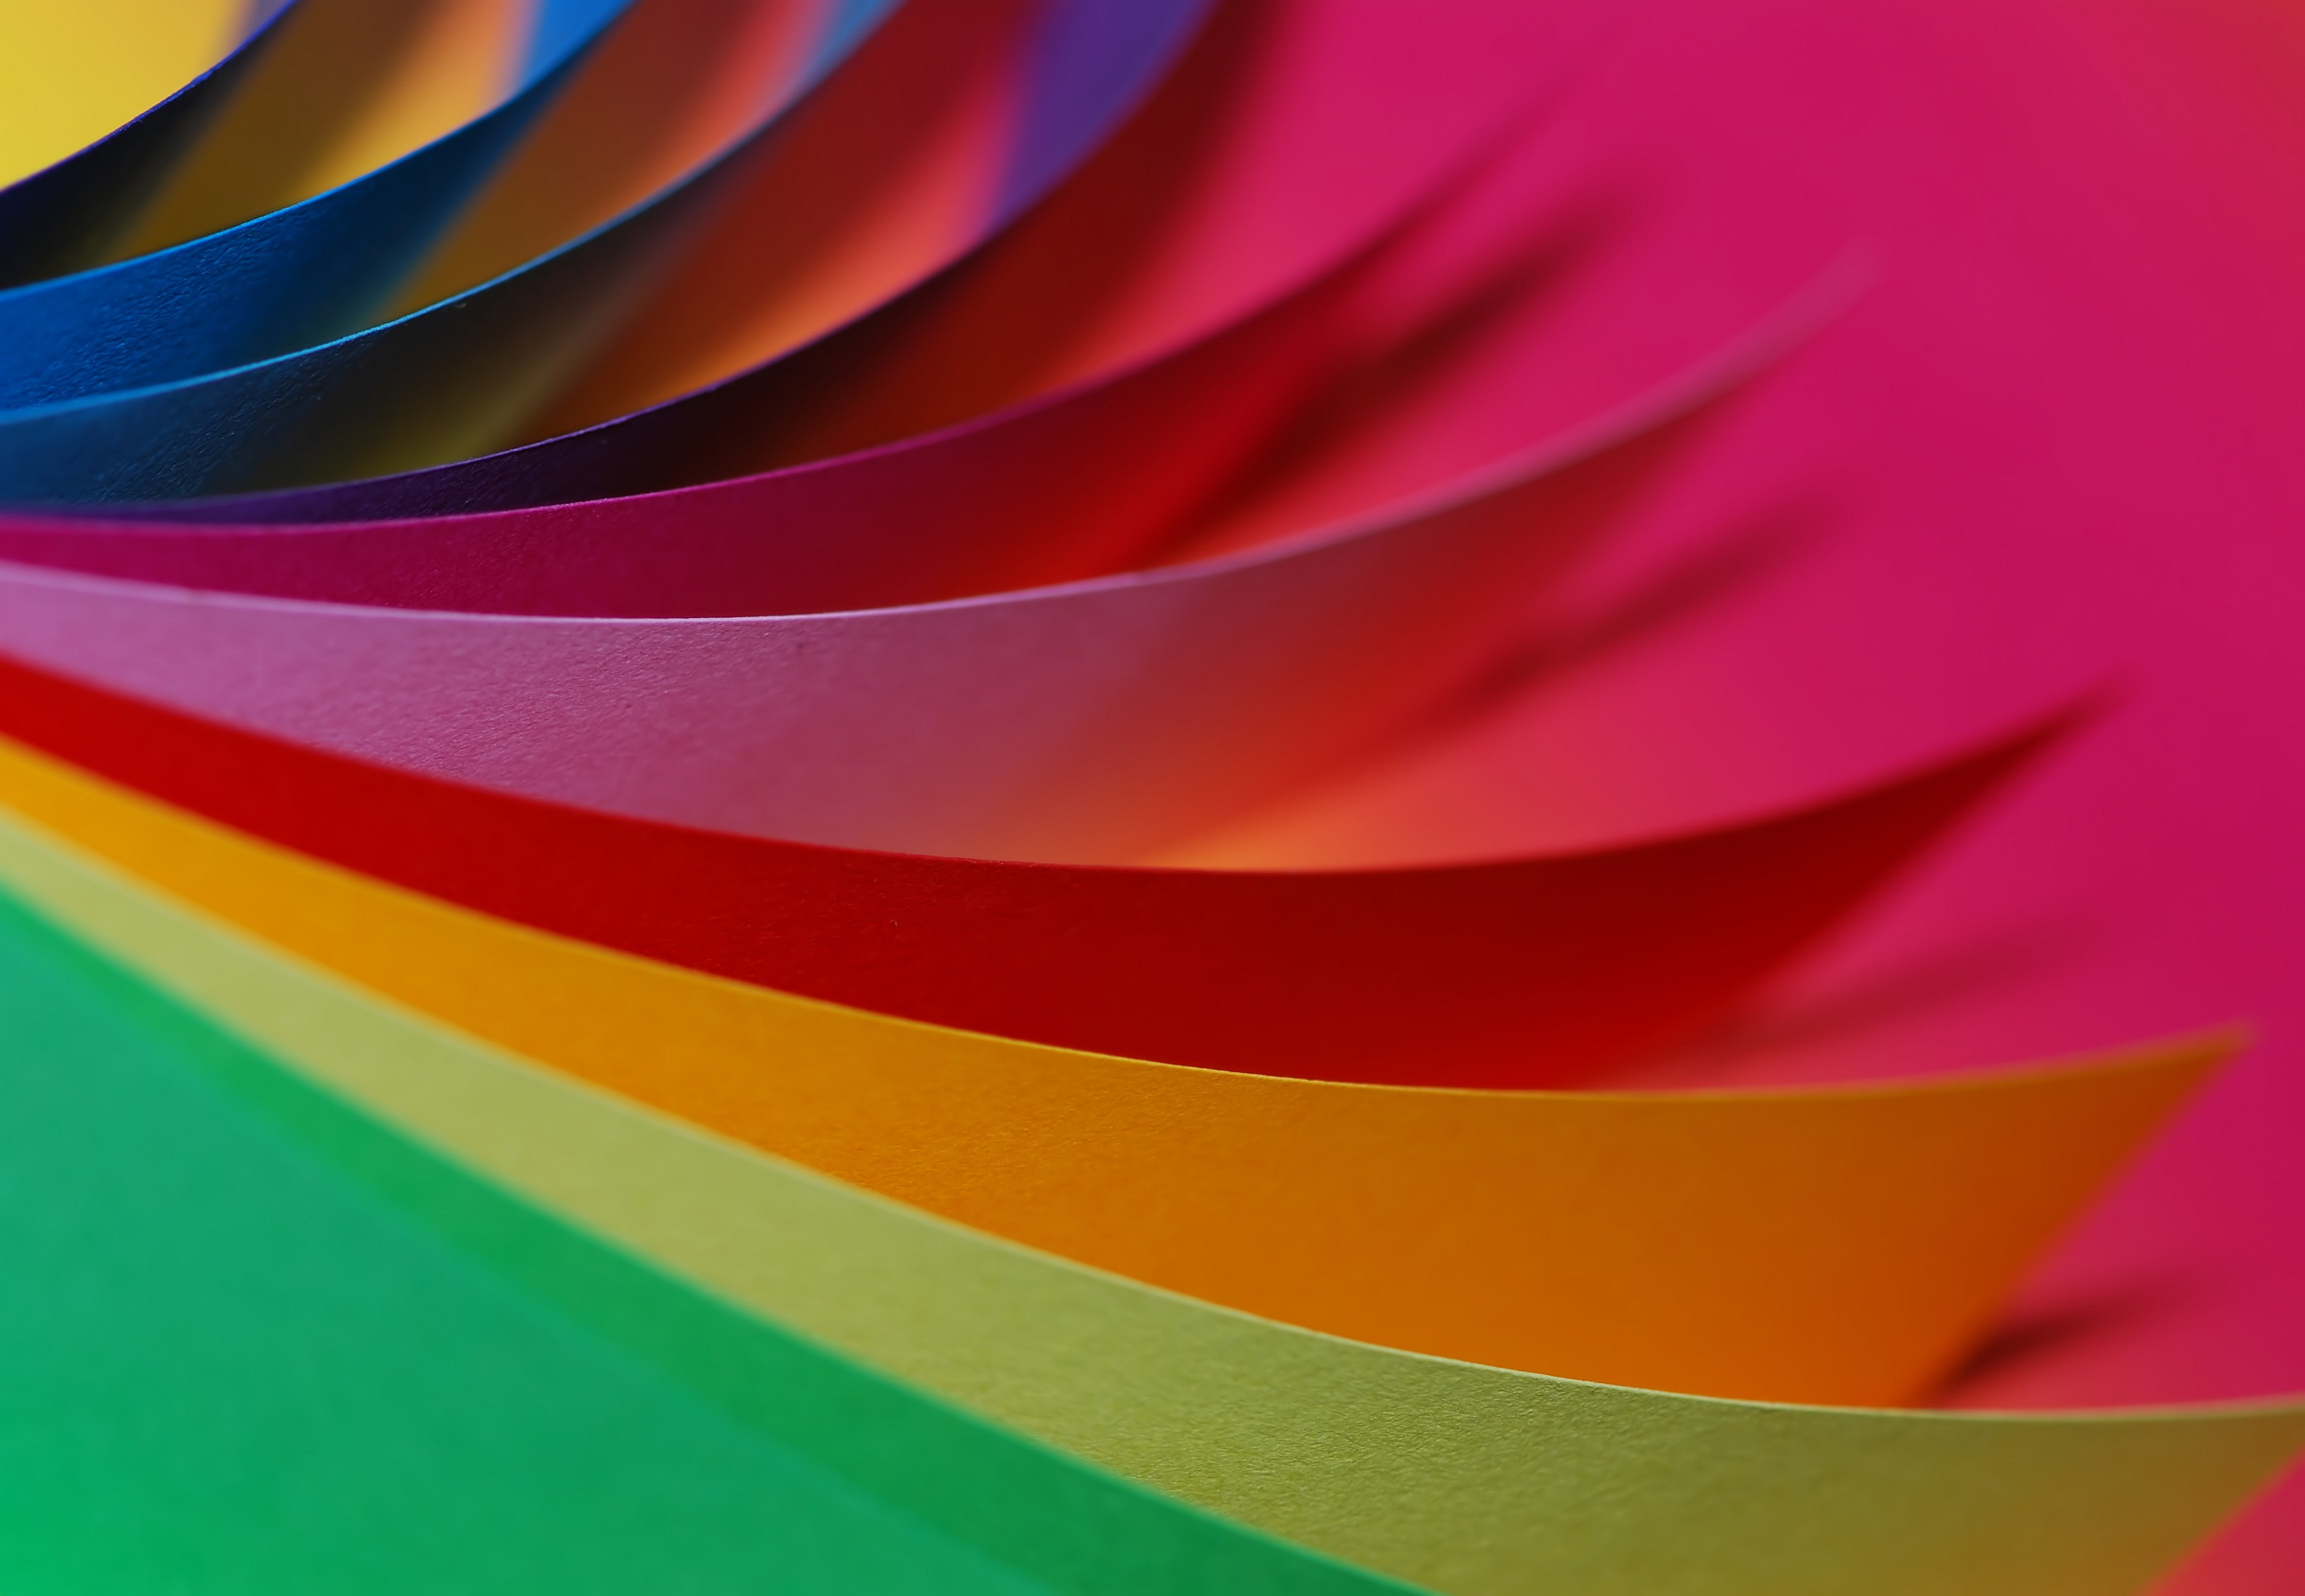 Paper HD wallpapers, Desktop wallpaper - most viewed